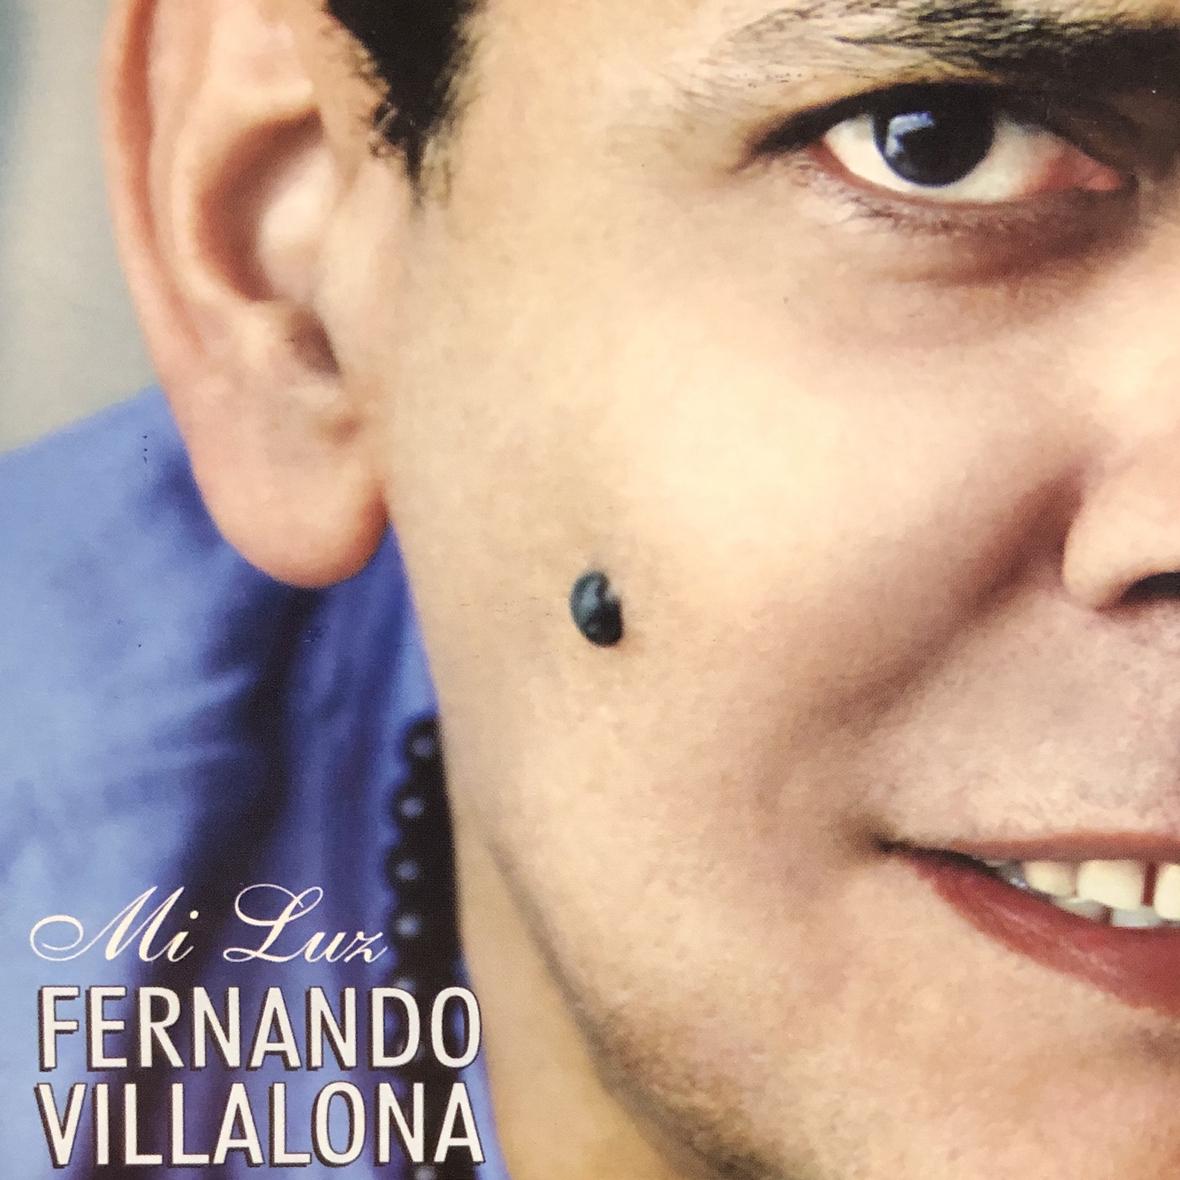 FERNANDO VILLALONA - MI LUZ